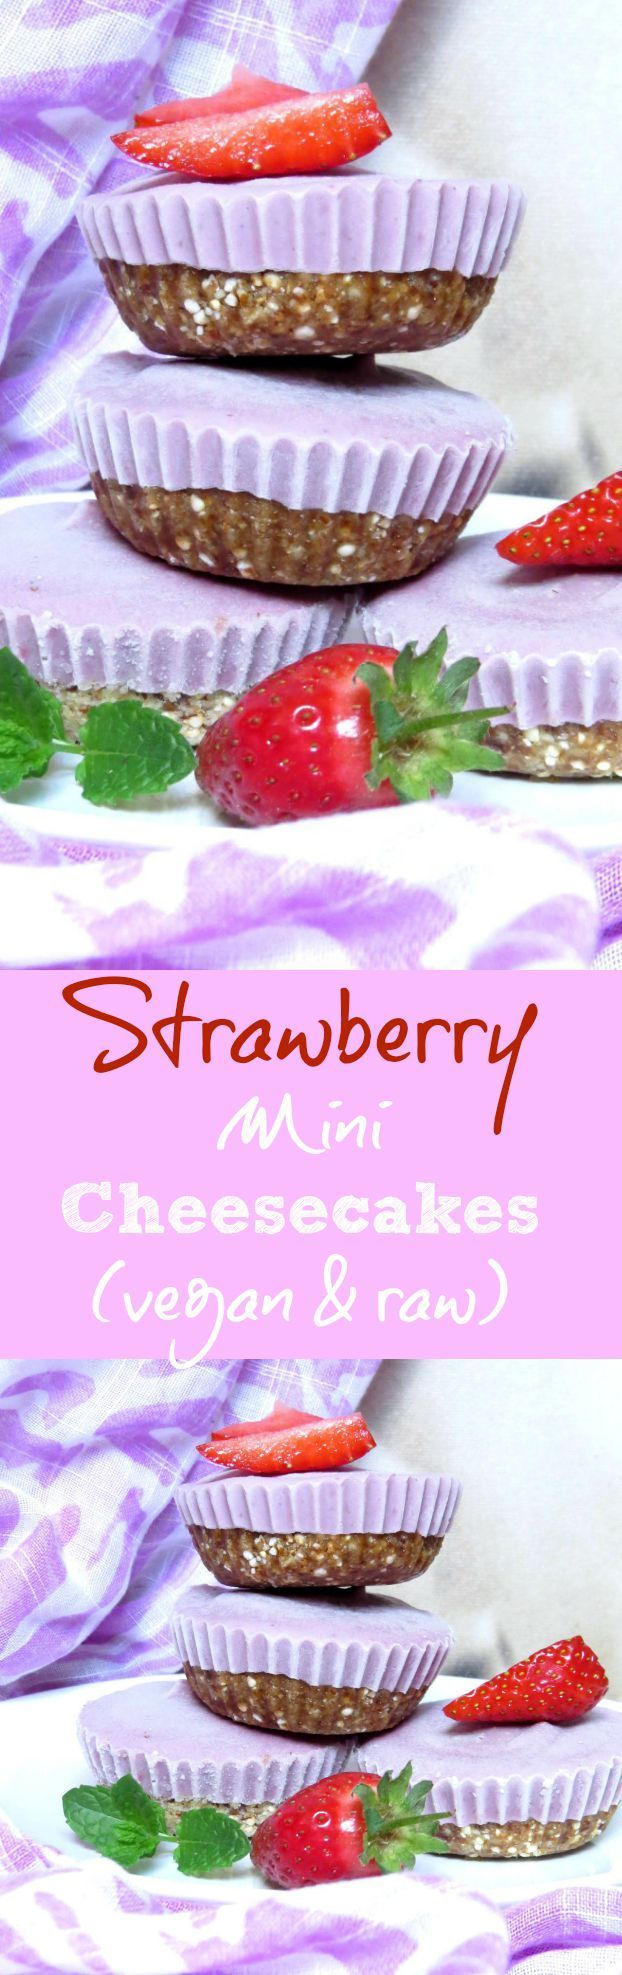 Vegan Strawberry Mini Cheesecakes. Check out veganheaven.org for the recipe. #vegan #cheesecake #rawcheesecake